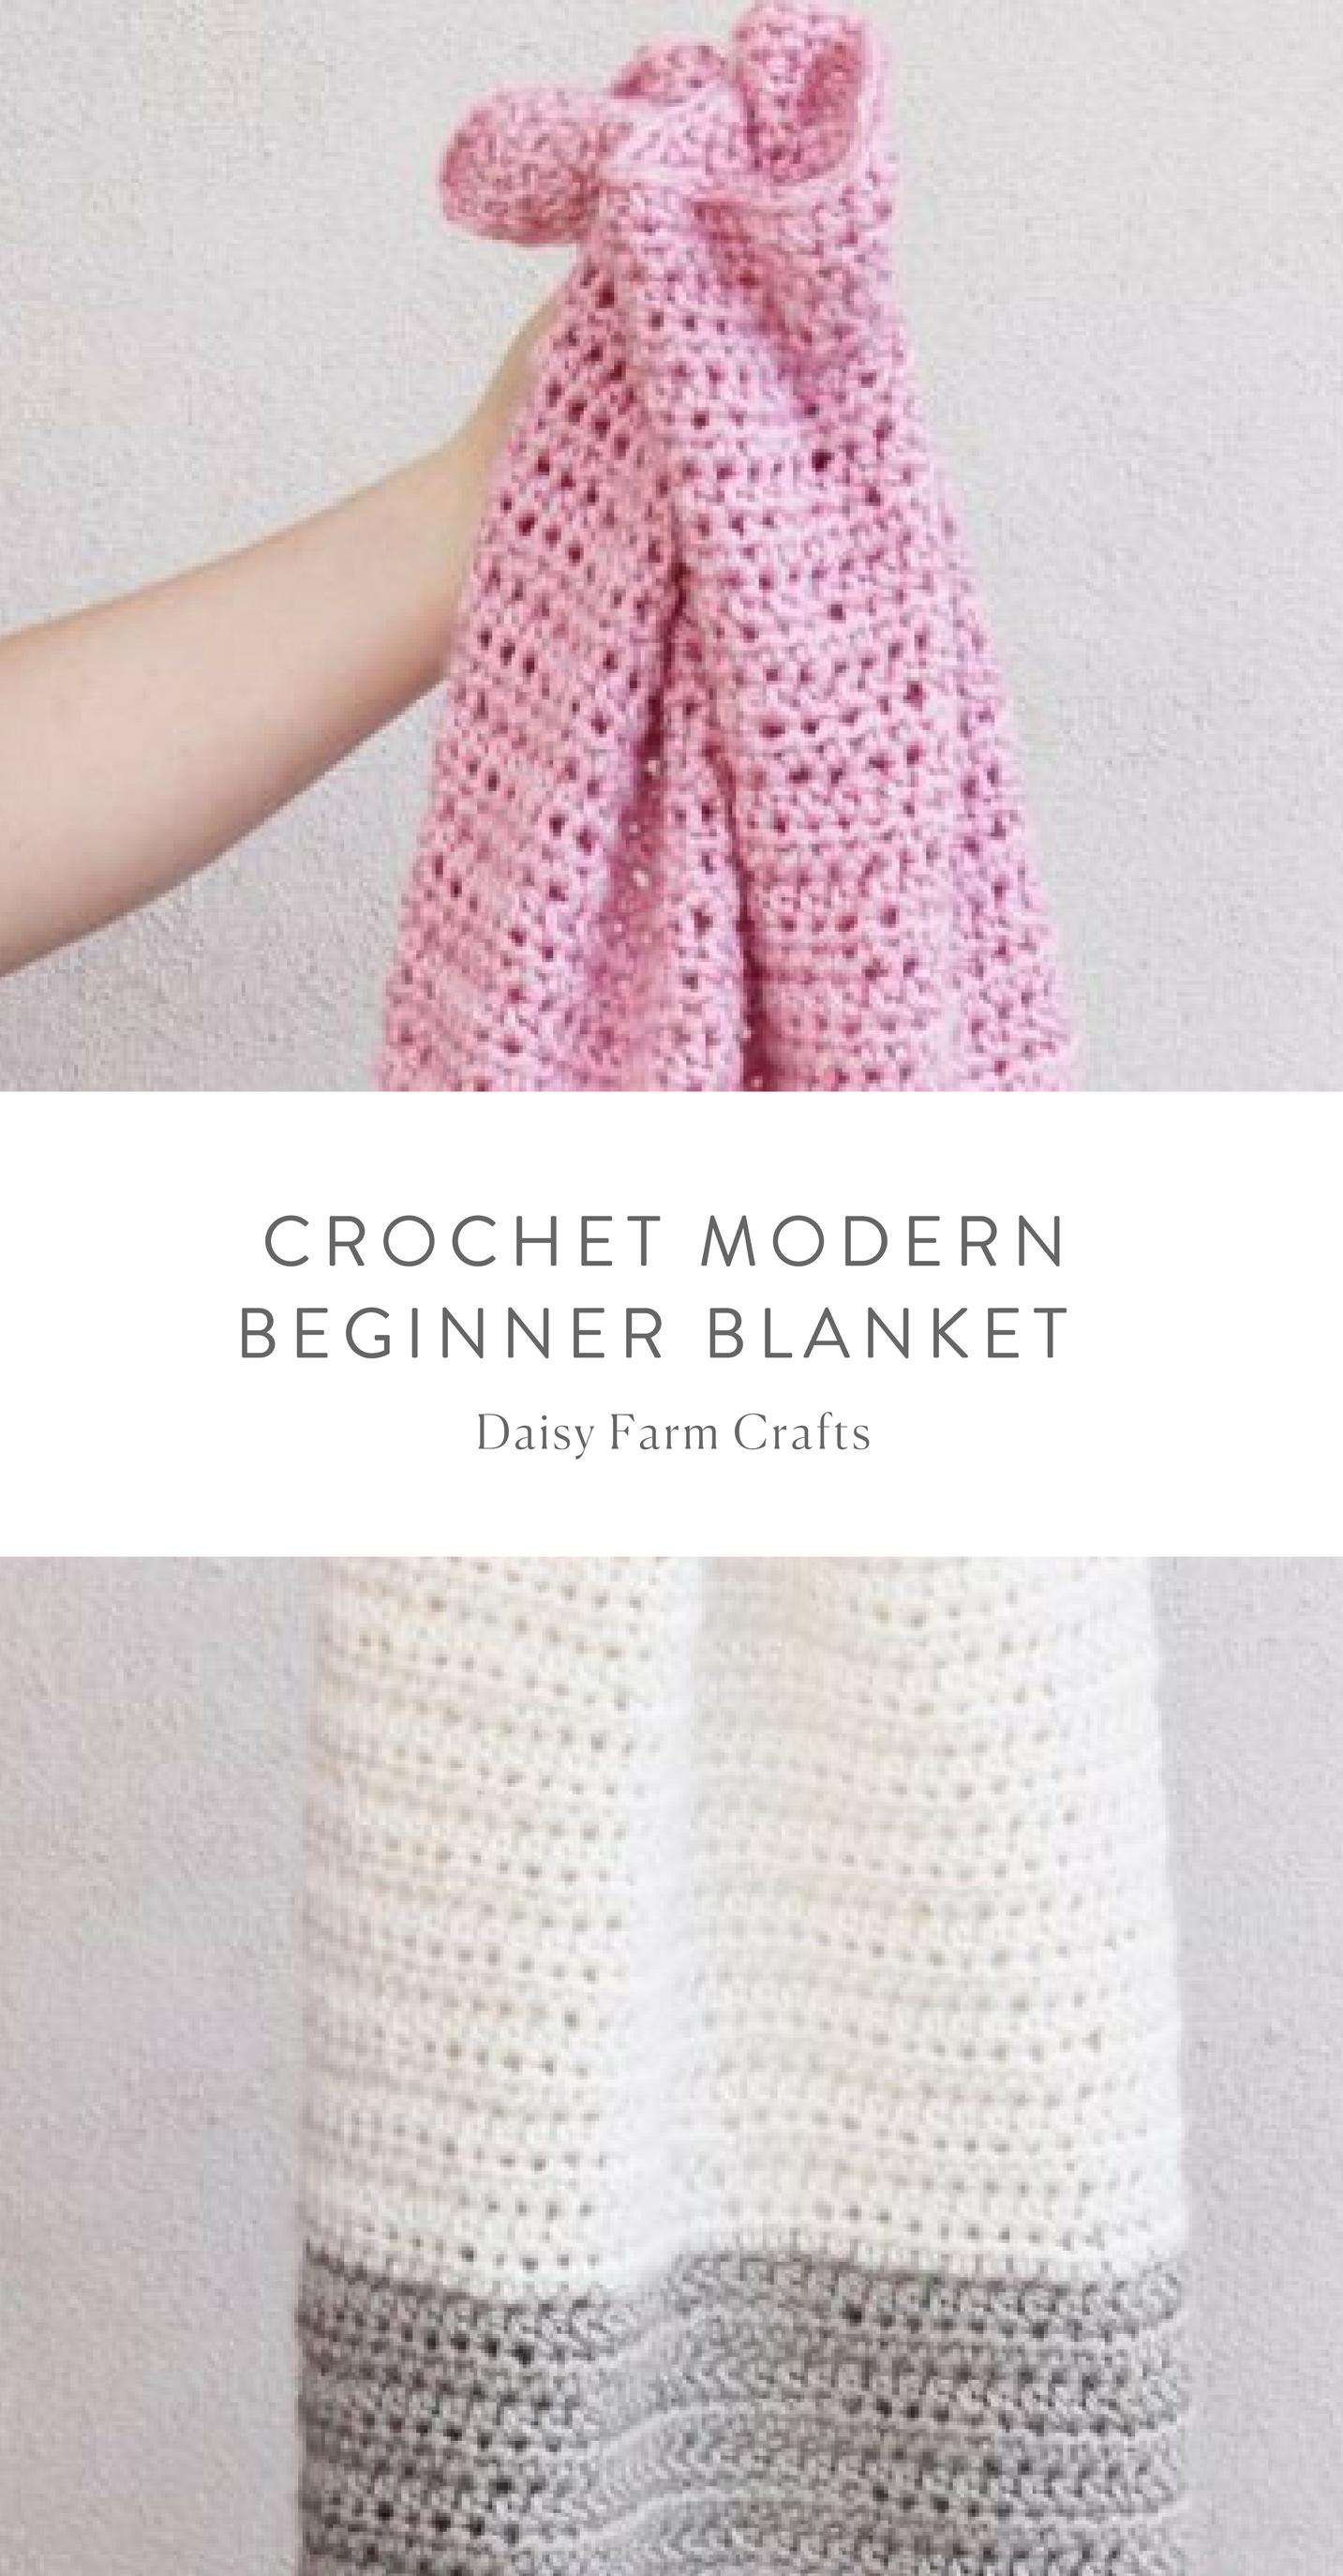 Free Pattern - Crochet Modern Beginner Blanket | Proyectos que ...